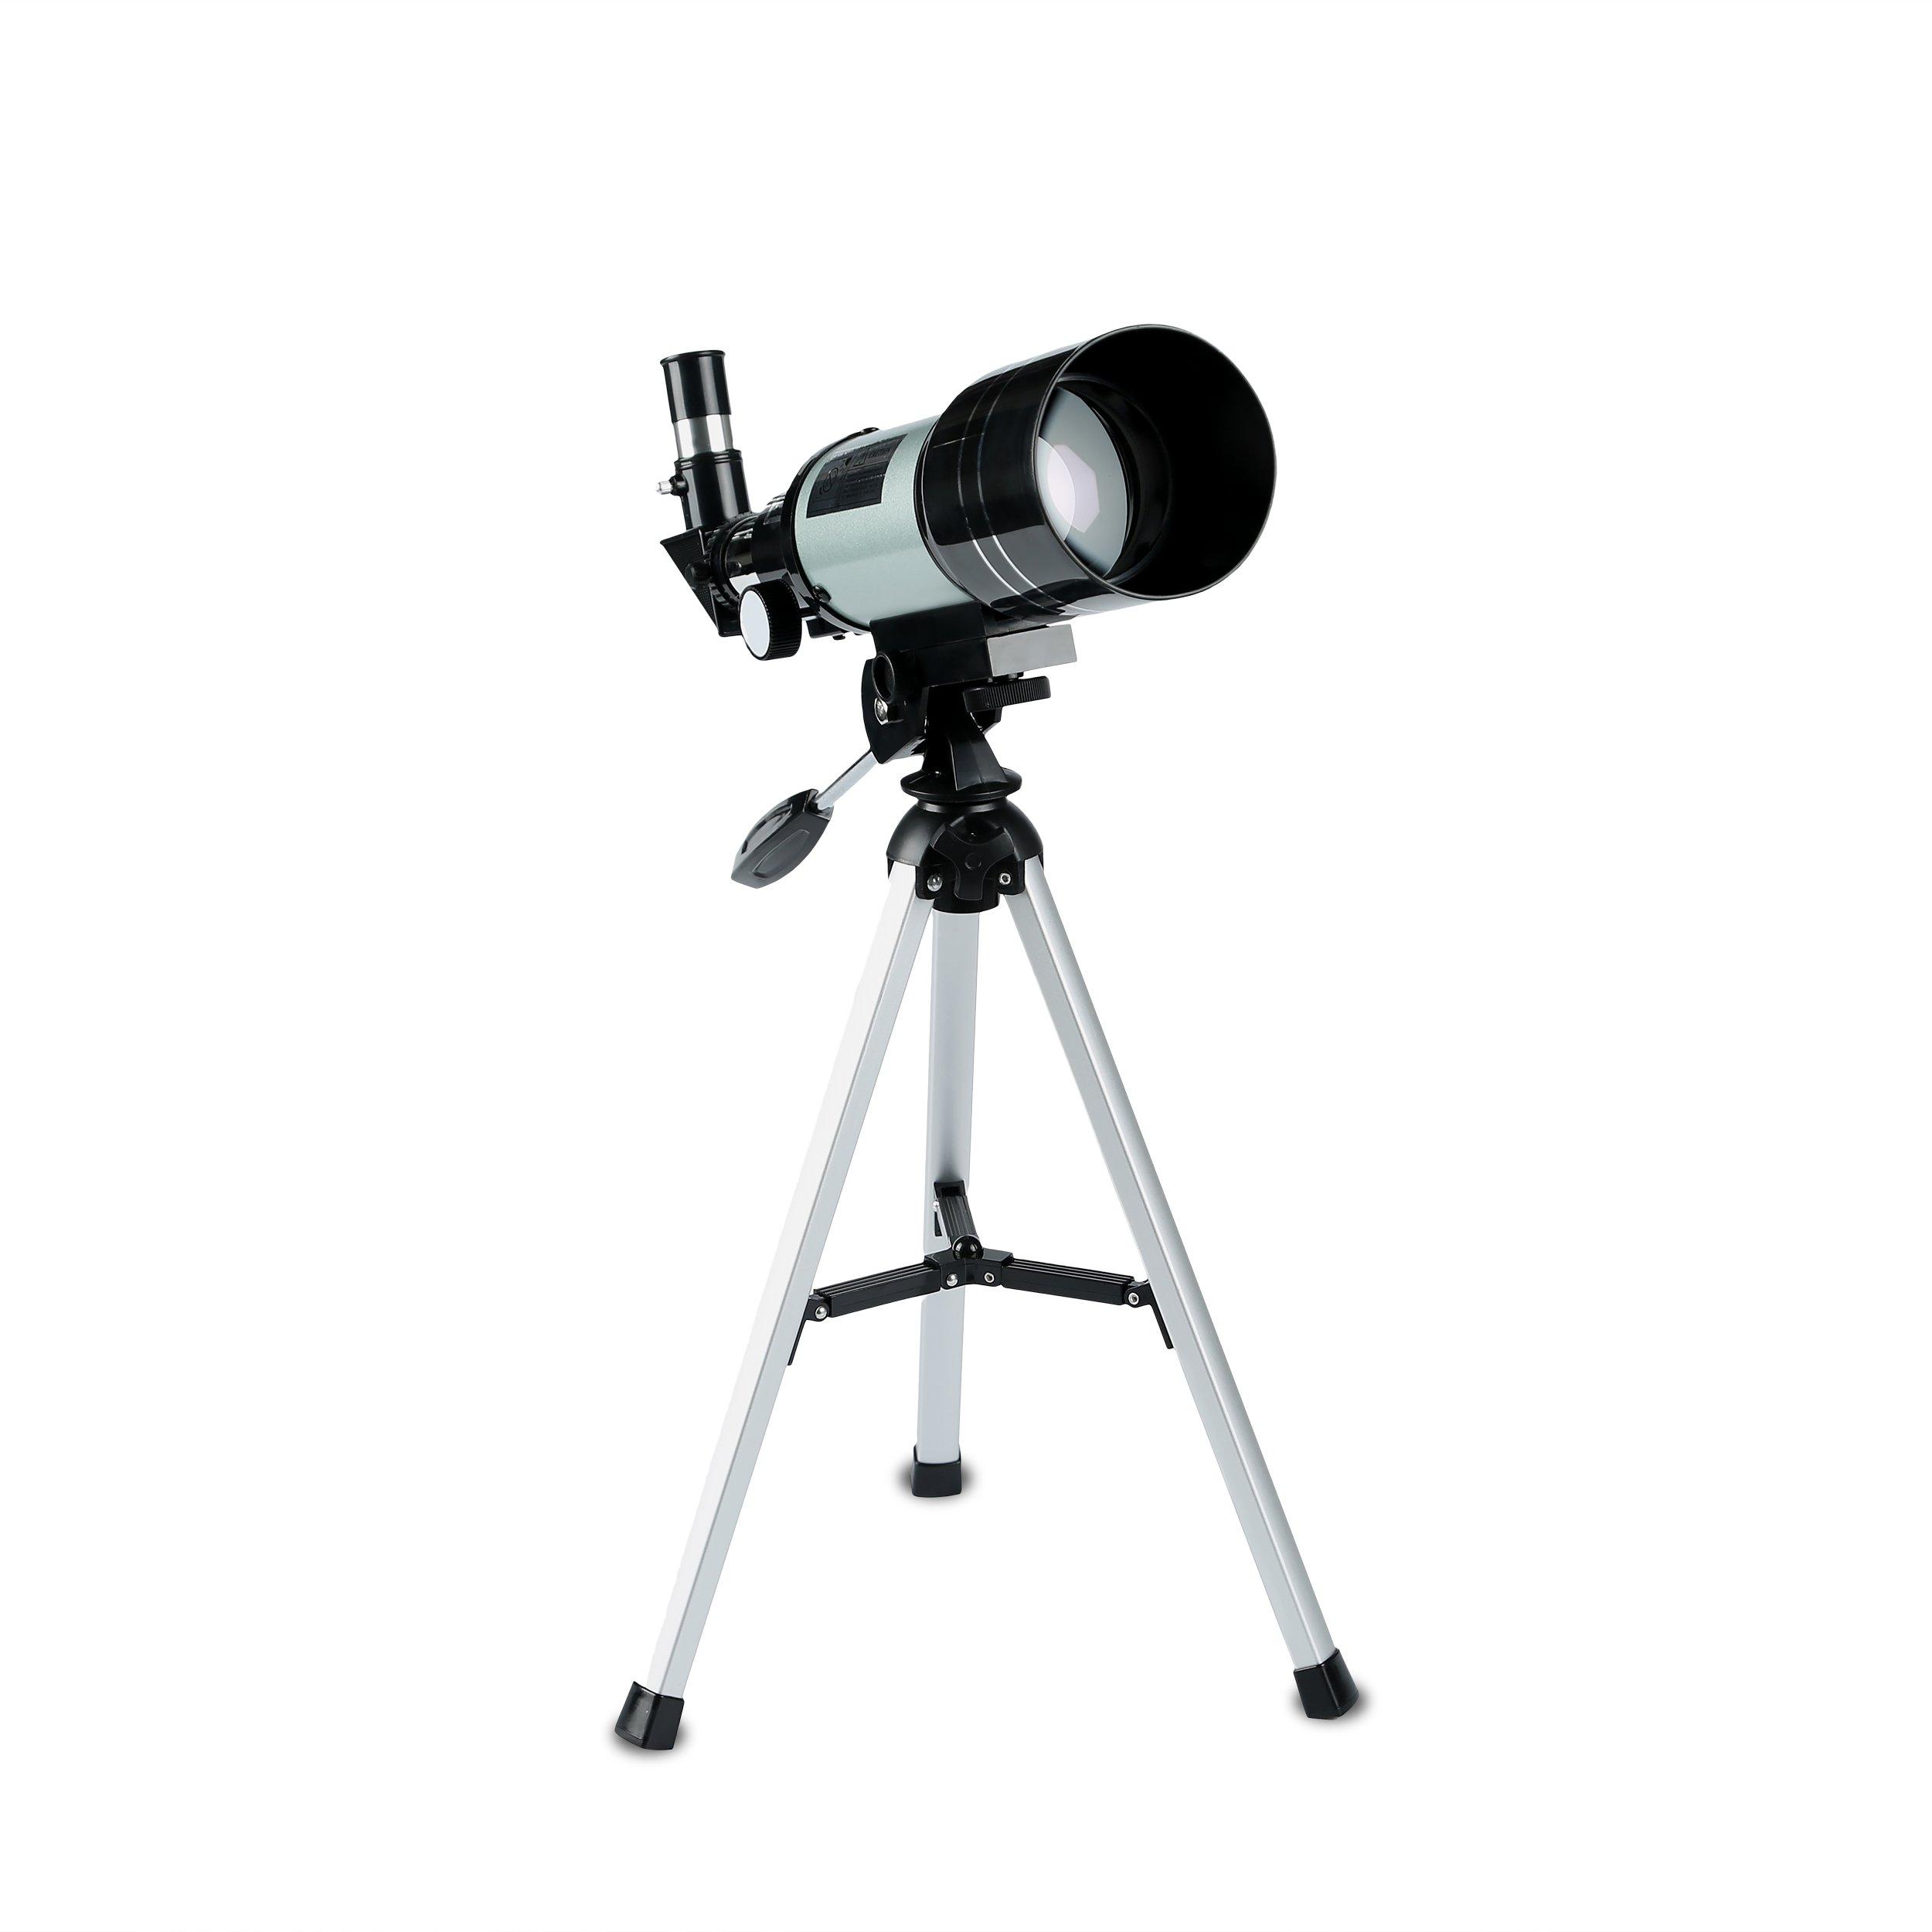 DQQ Telescope for Kids Sky Monocular Telescopes for Astronomy Beginners with Tripod Black 70mm,3X Barlow Lens